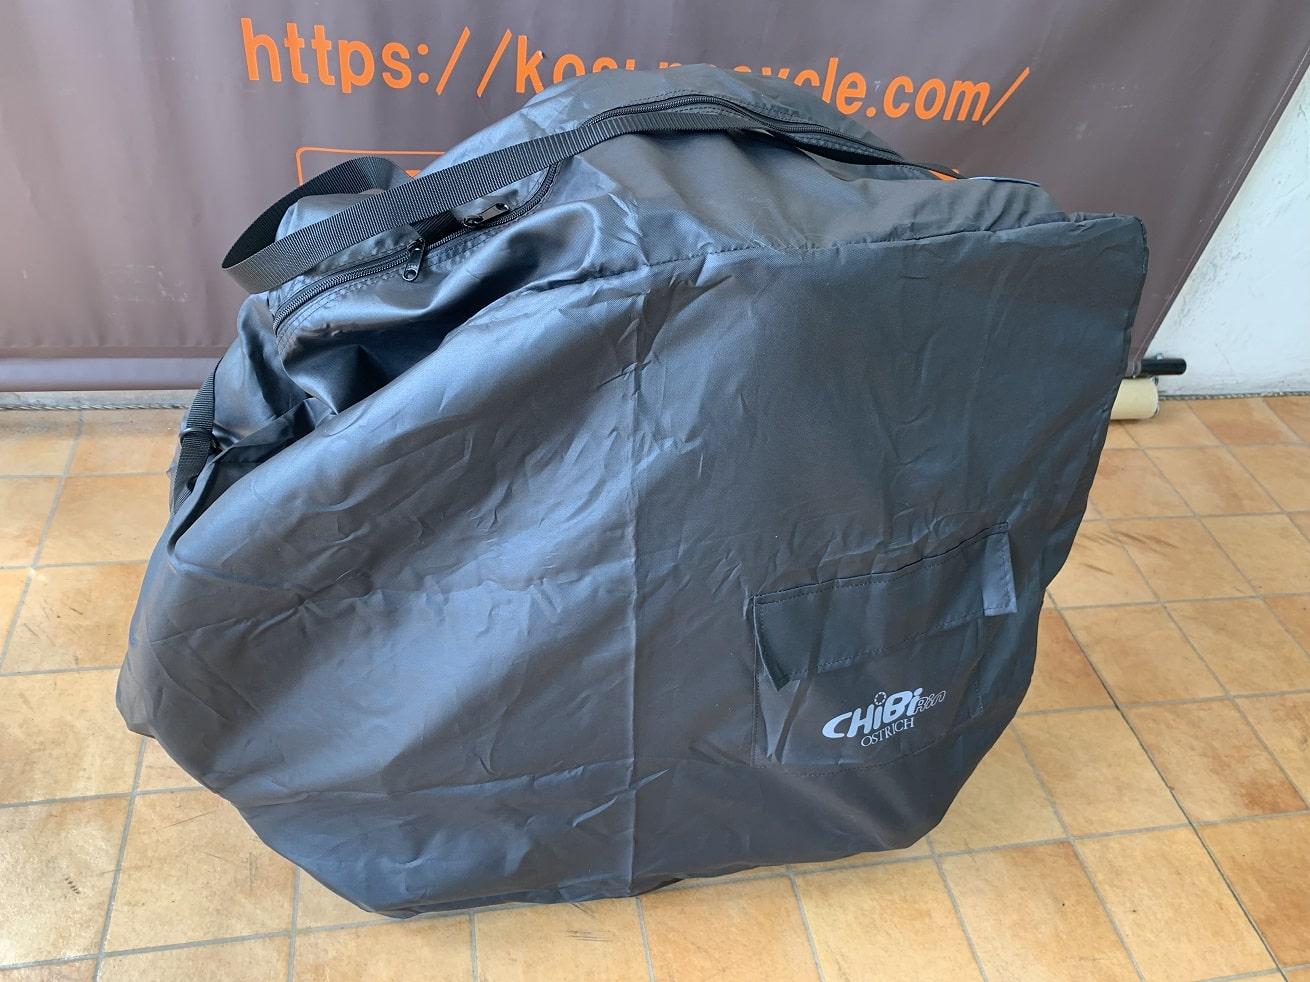 ESRパーサーをオーストリッチのちび輪バッグ輪行袋に収納完了